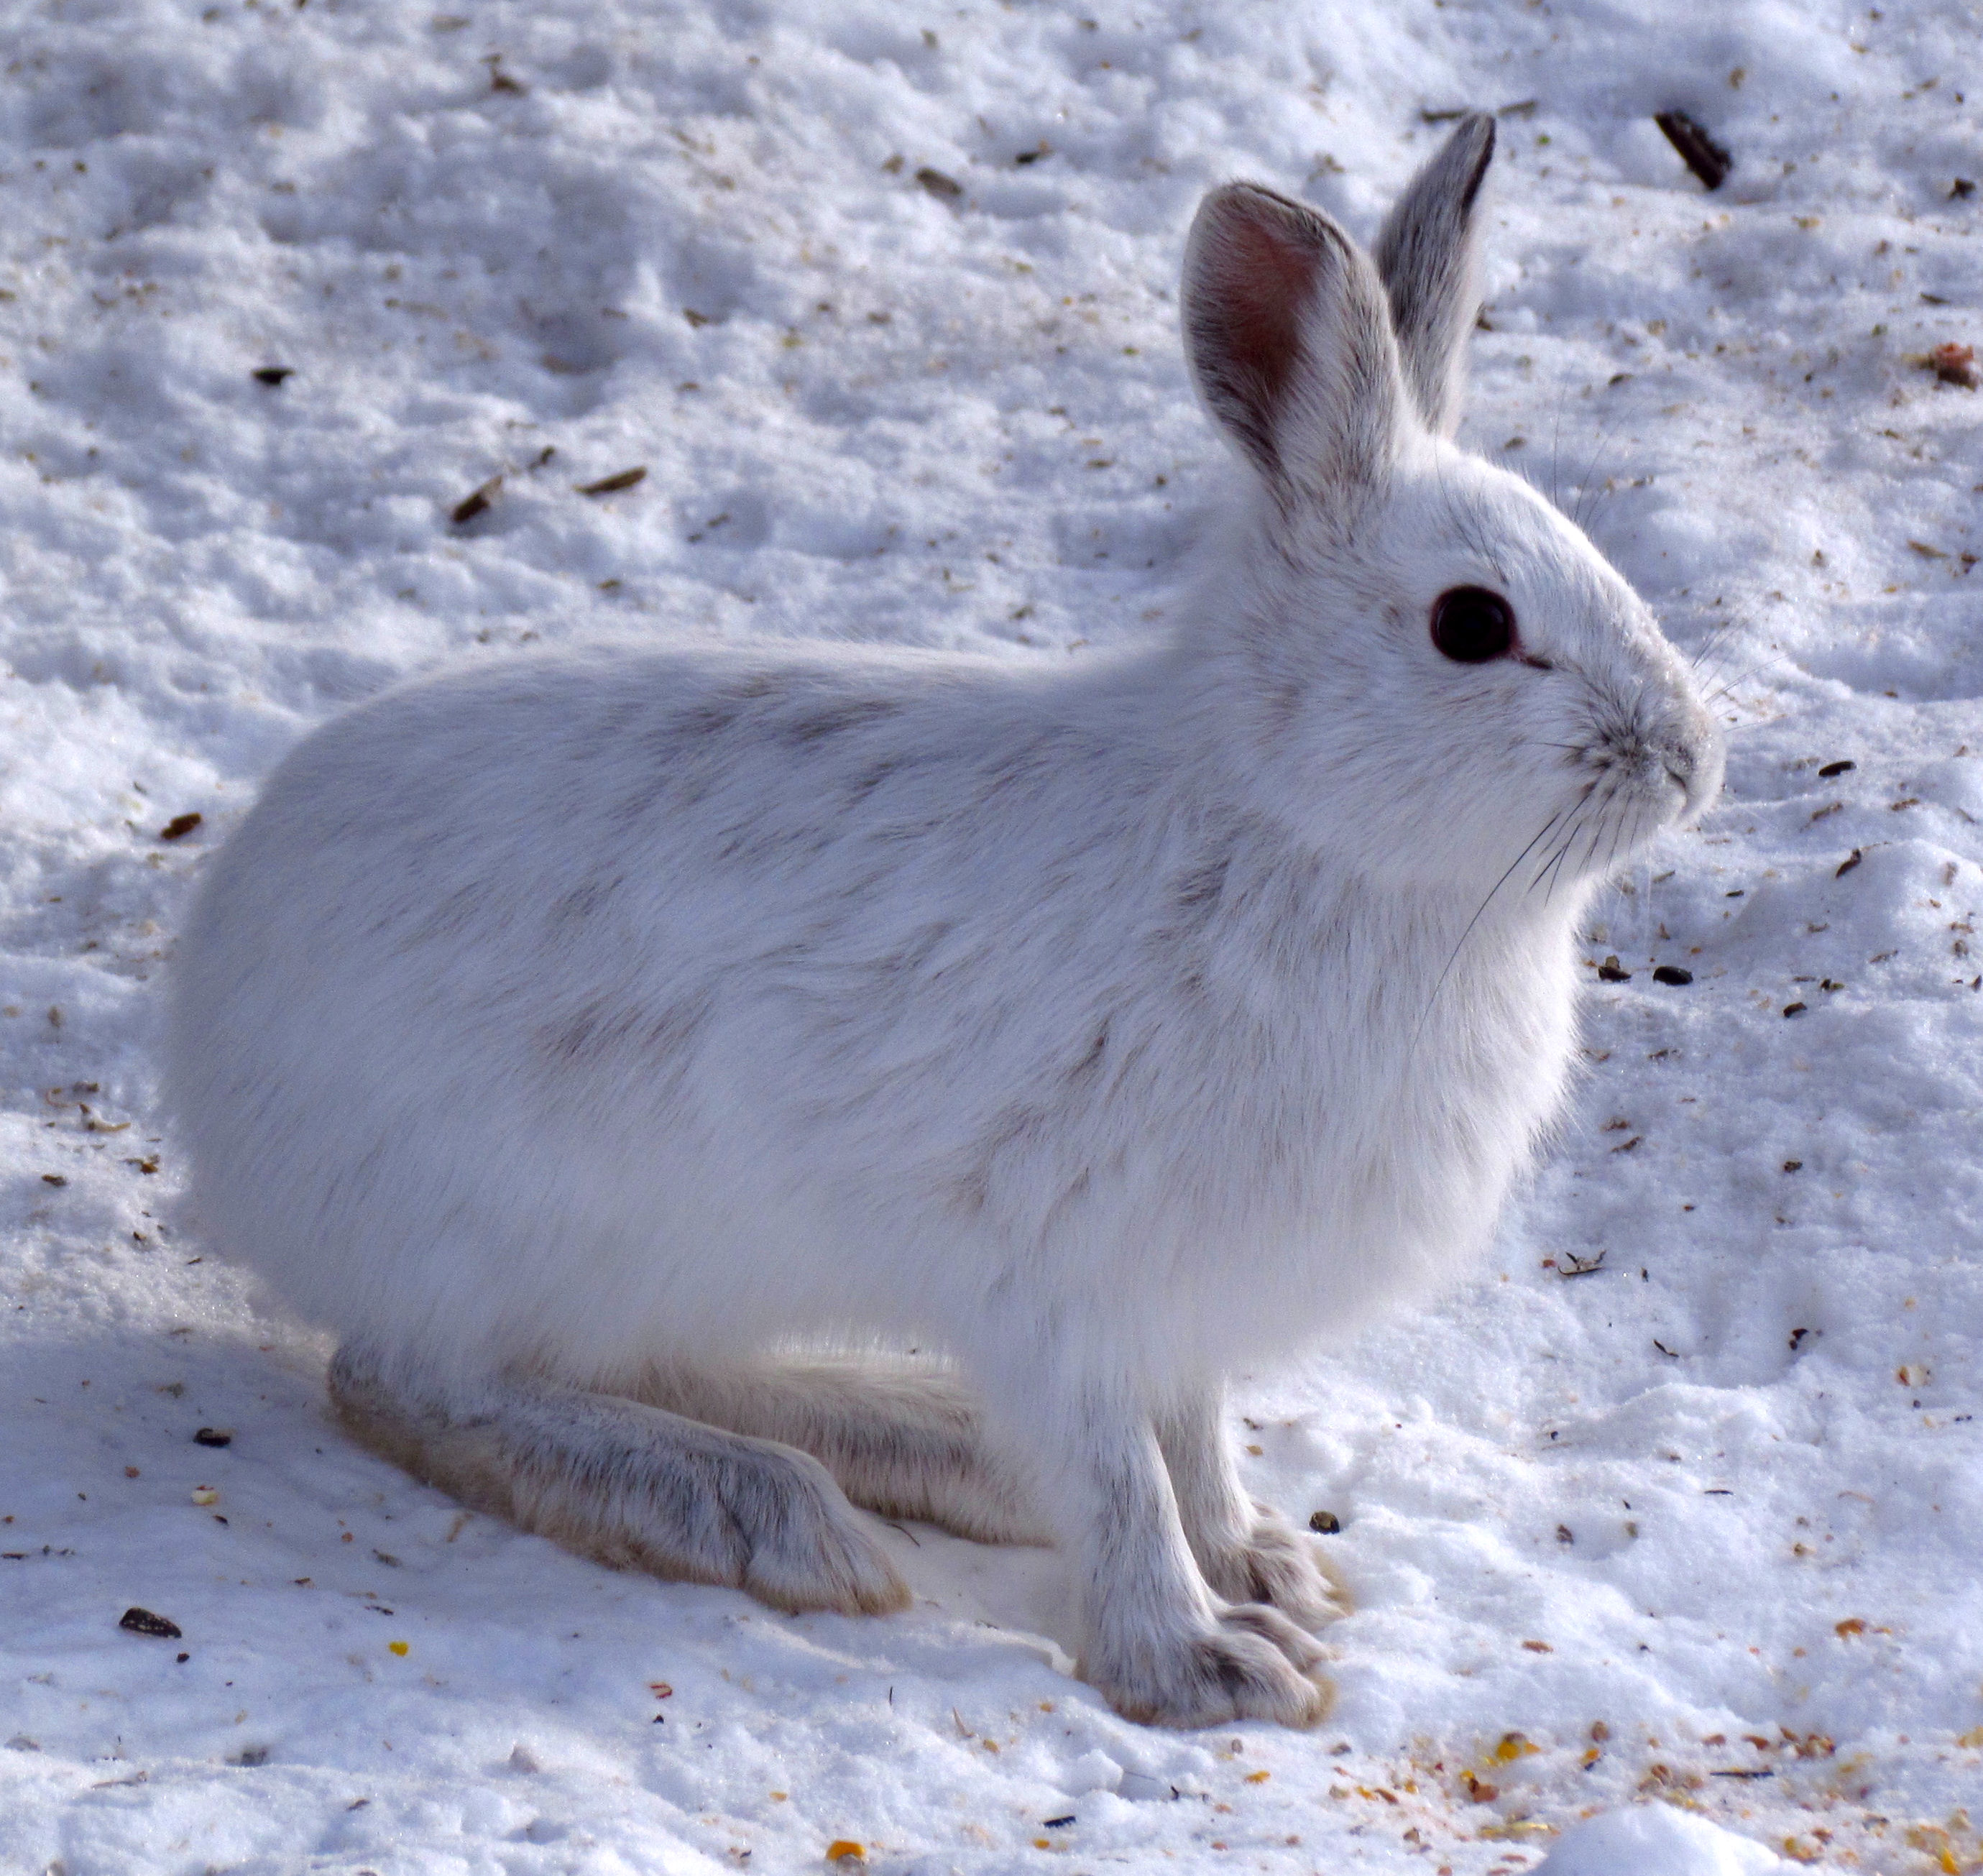 File:Snowshoe Hare, Shirleys Bay.jpg - Wikimedia Commons